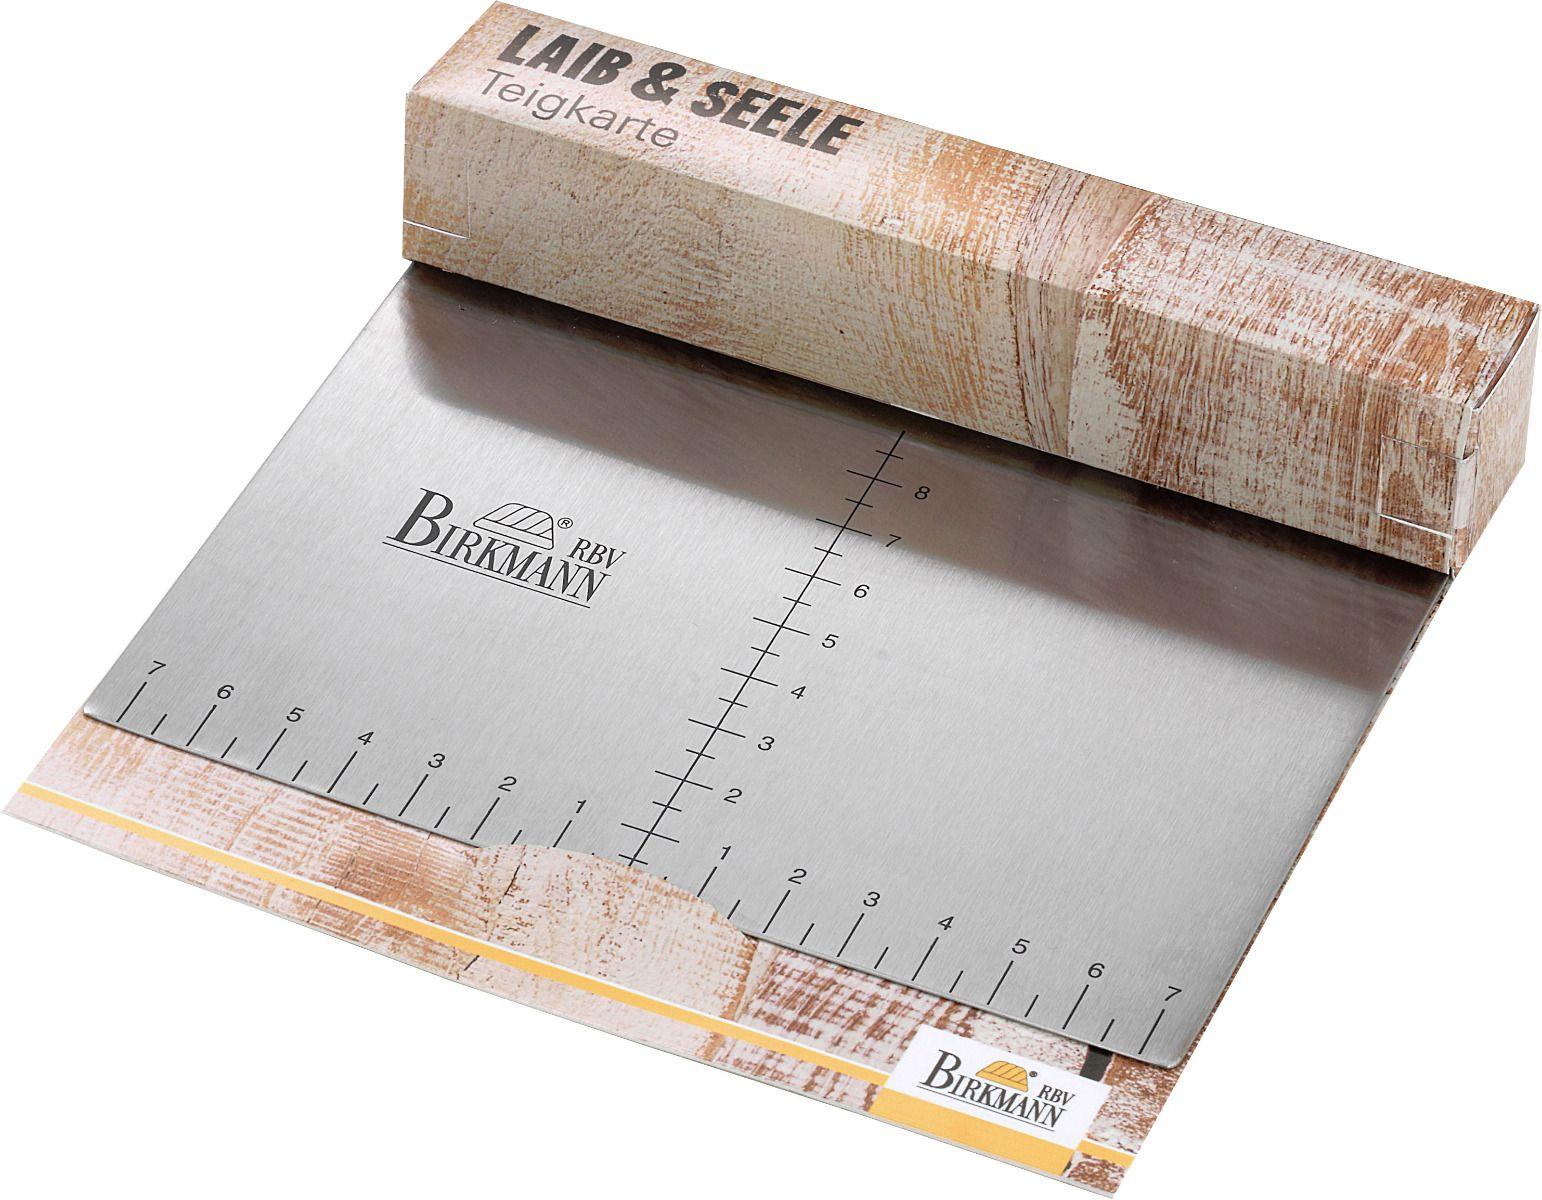 Teigkarte 15 x 11,5 cm